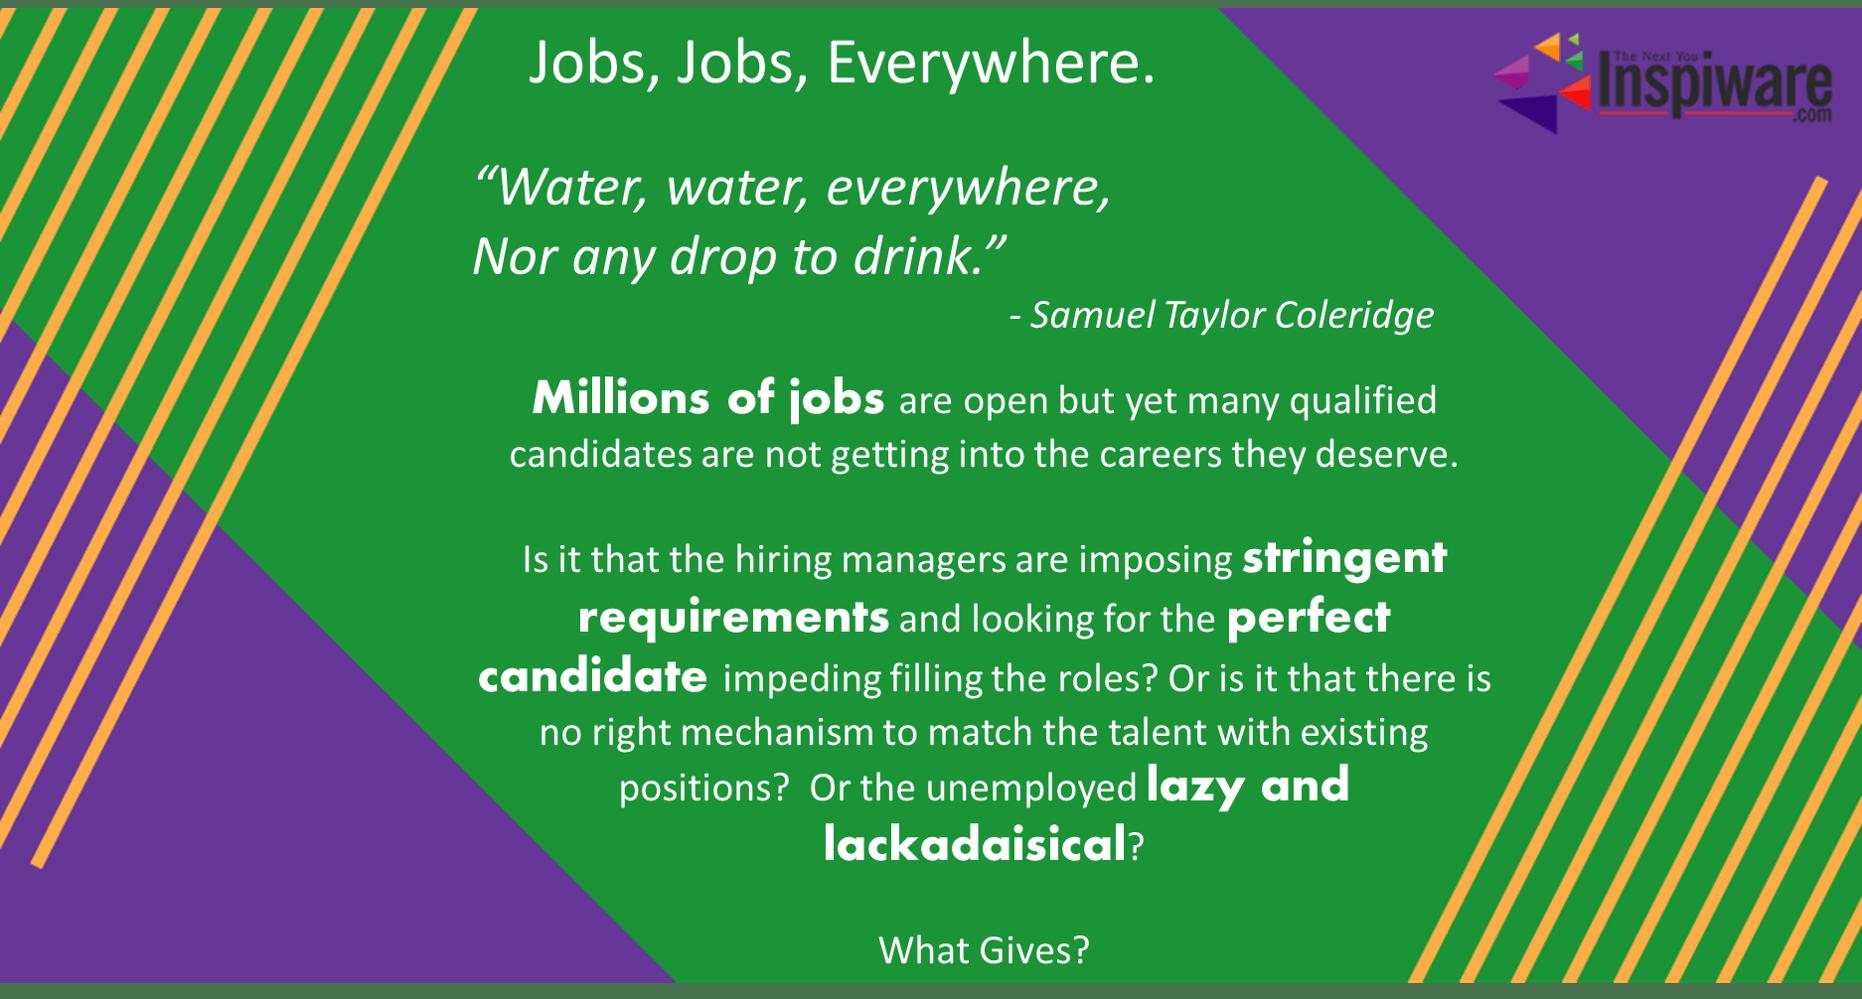 Jobs Jobs Everywhere